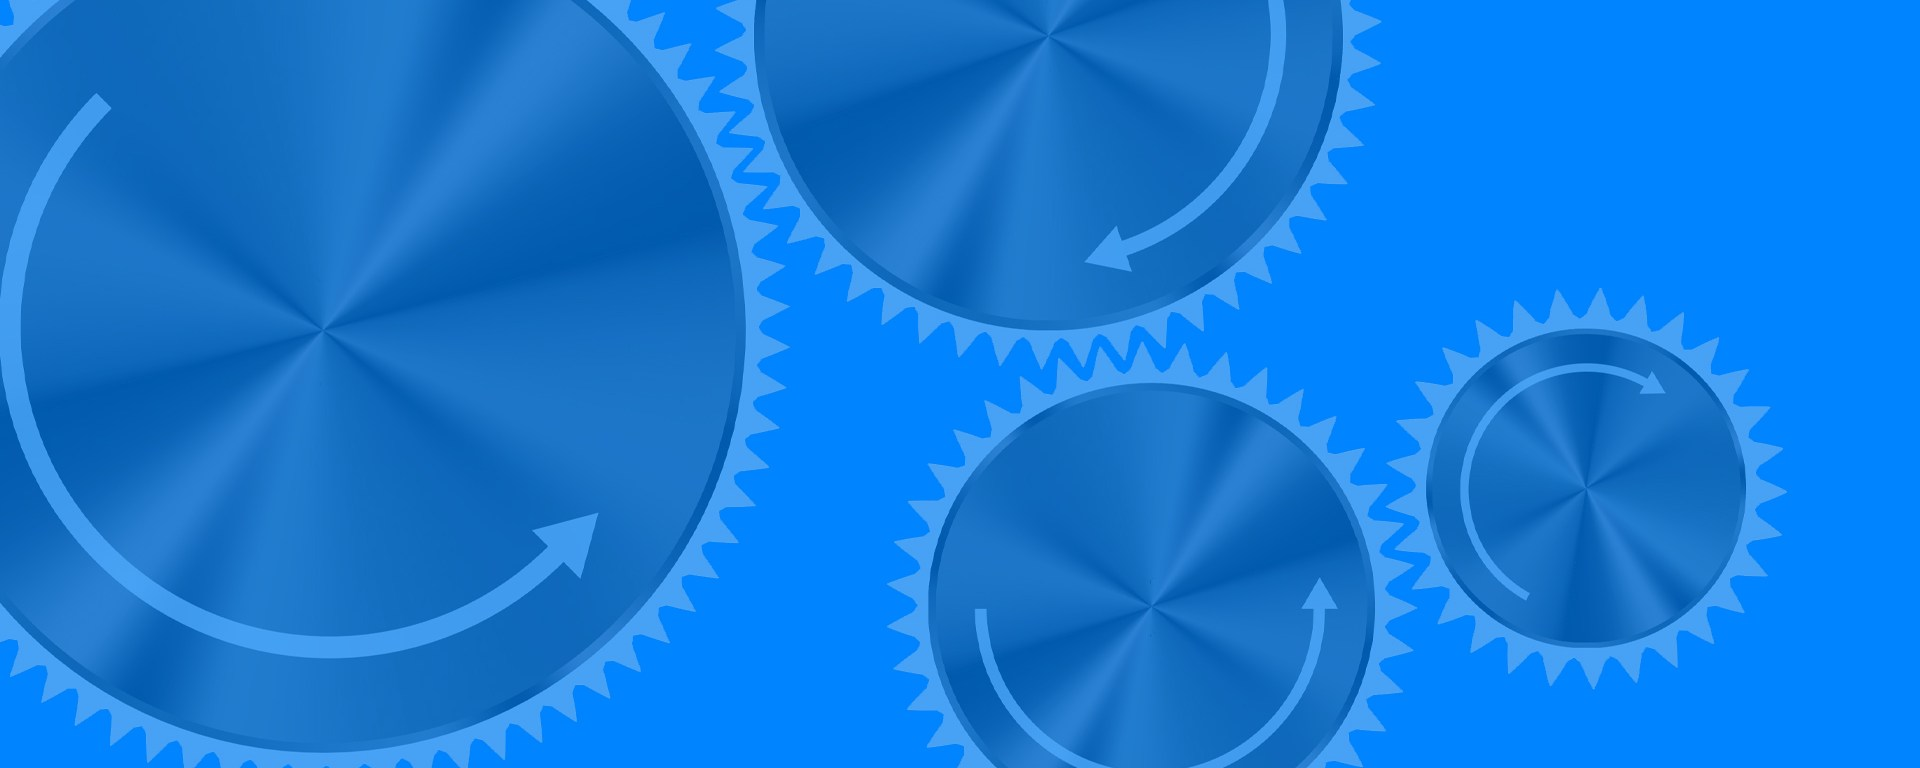 HFPG Gears_2.1.16